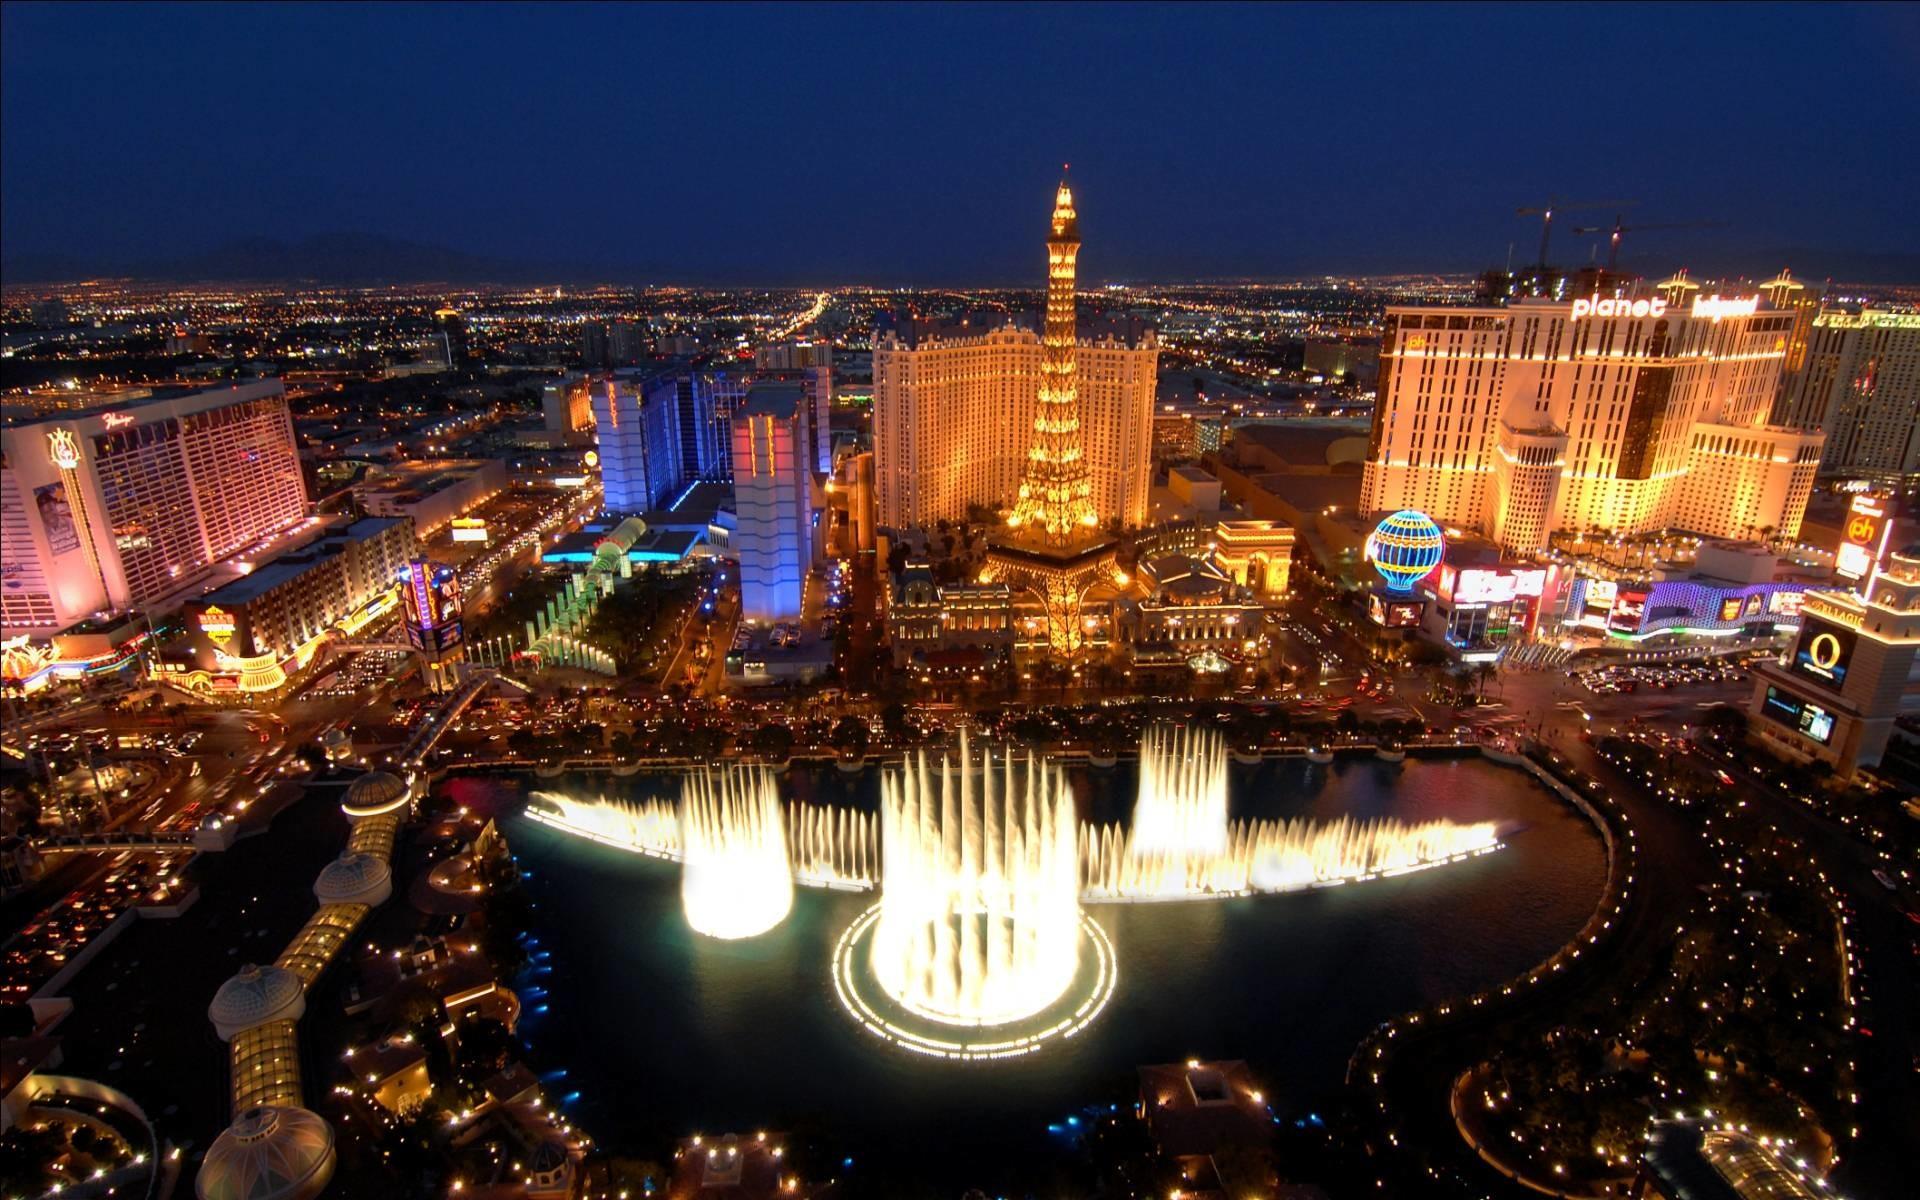 Las Vegas Desktop Wallpaper 60 Images